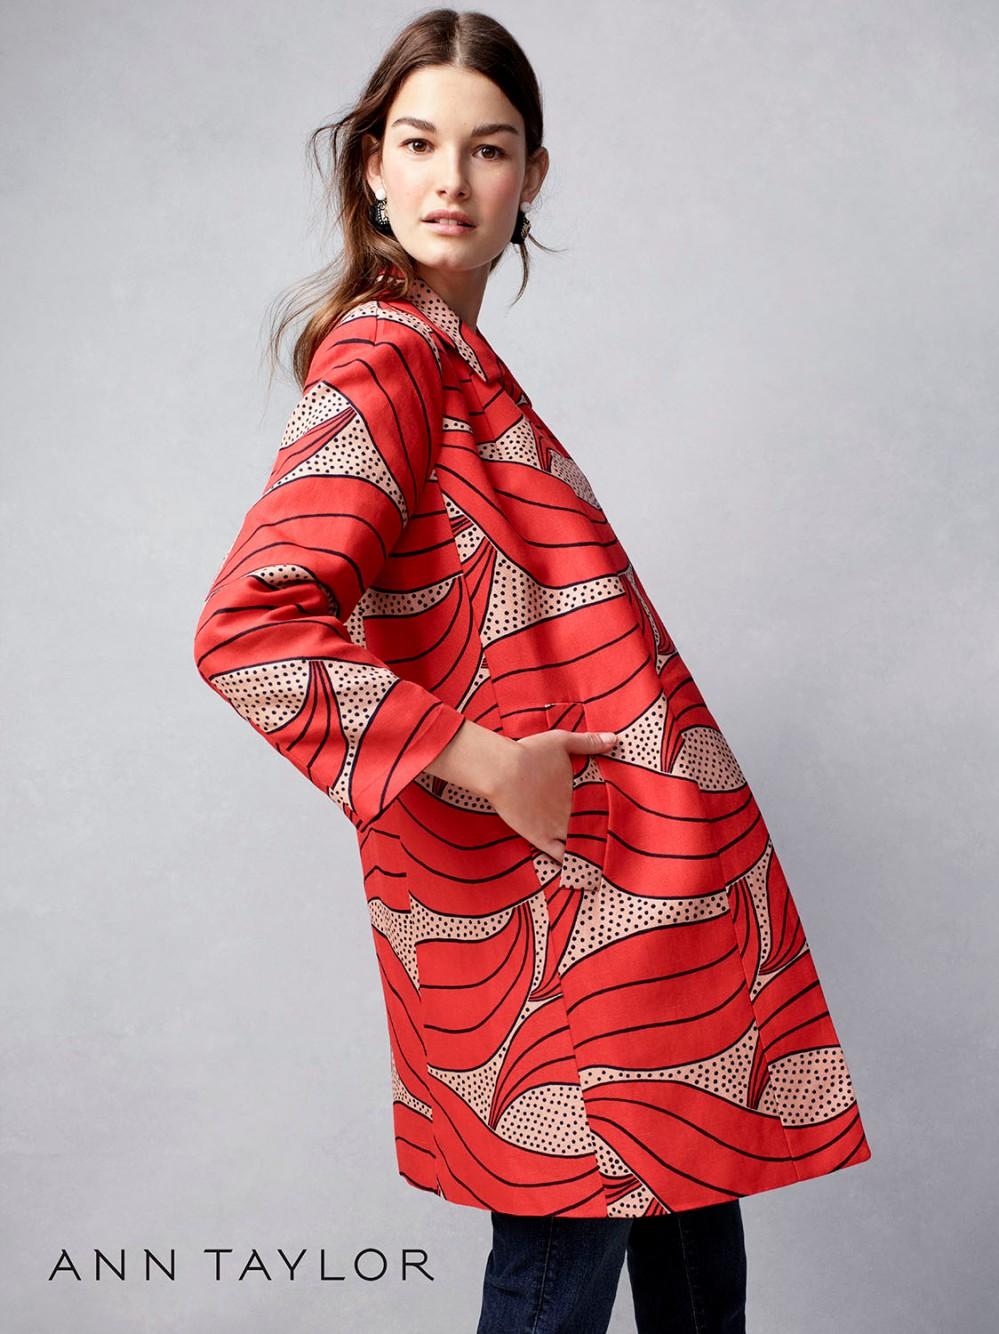 Ann Taylor_MEI TAO_Thomas Treuhaft_April17_Dresses_Fashion Photography 4